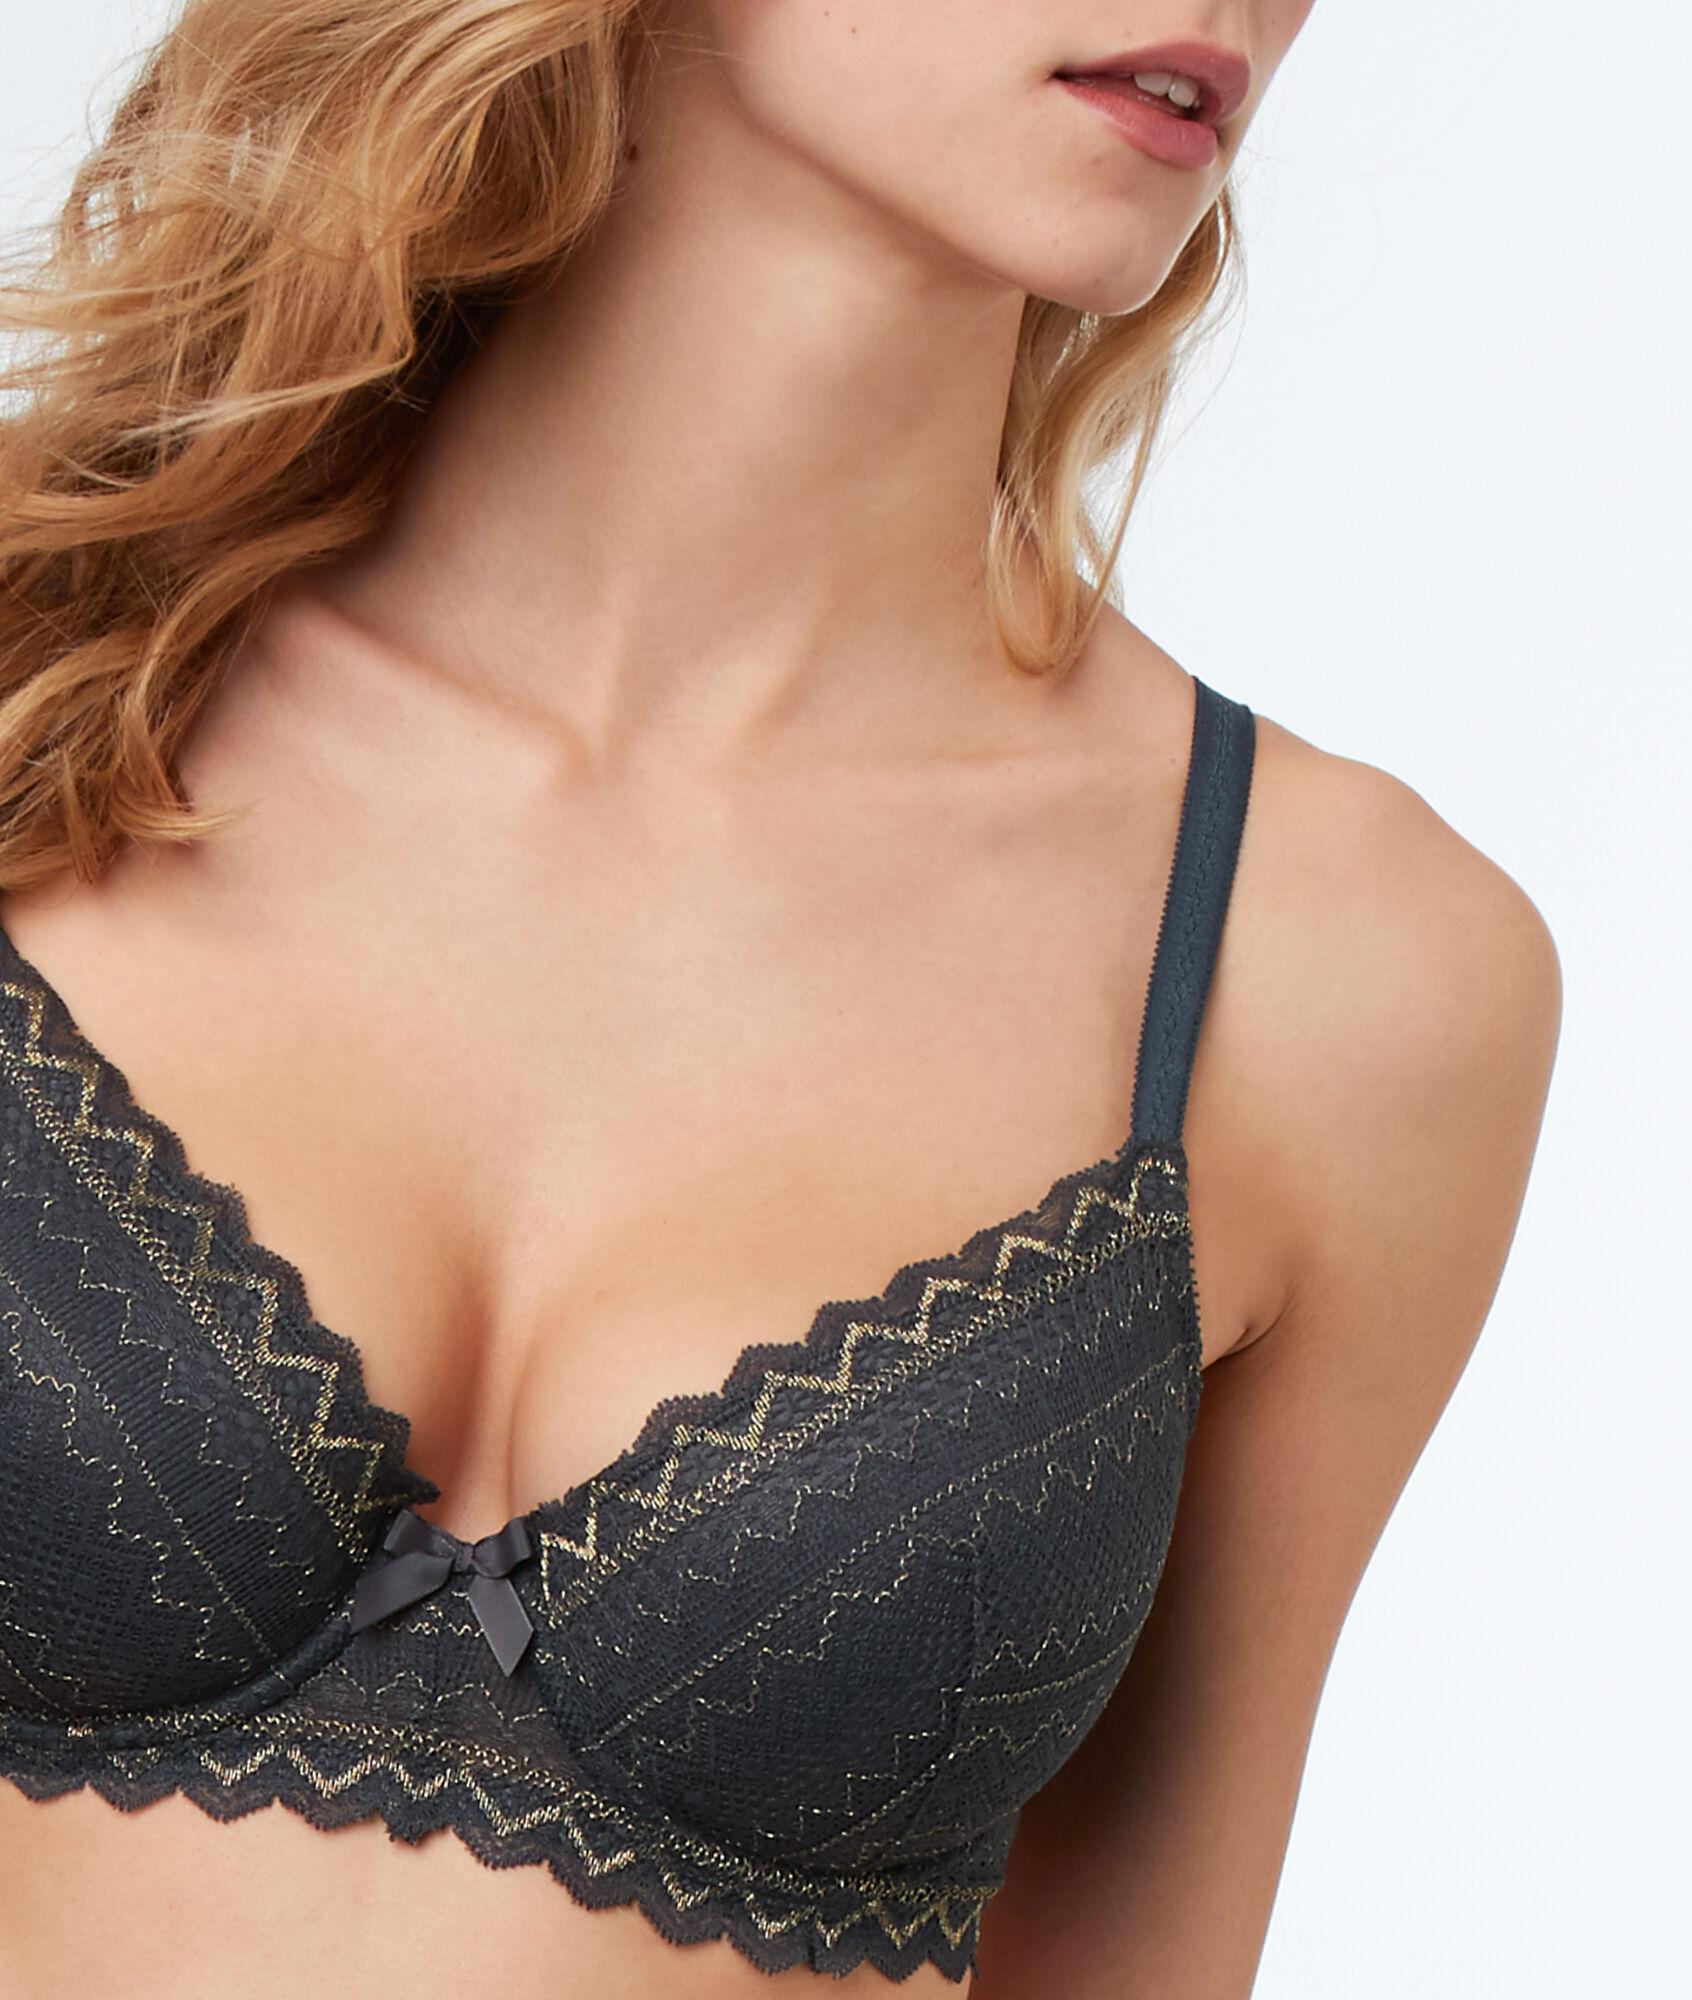 e6ba8b12a2 Lace demi-cup padded bra - ICONE - CHARCOAL - Etam